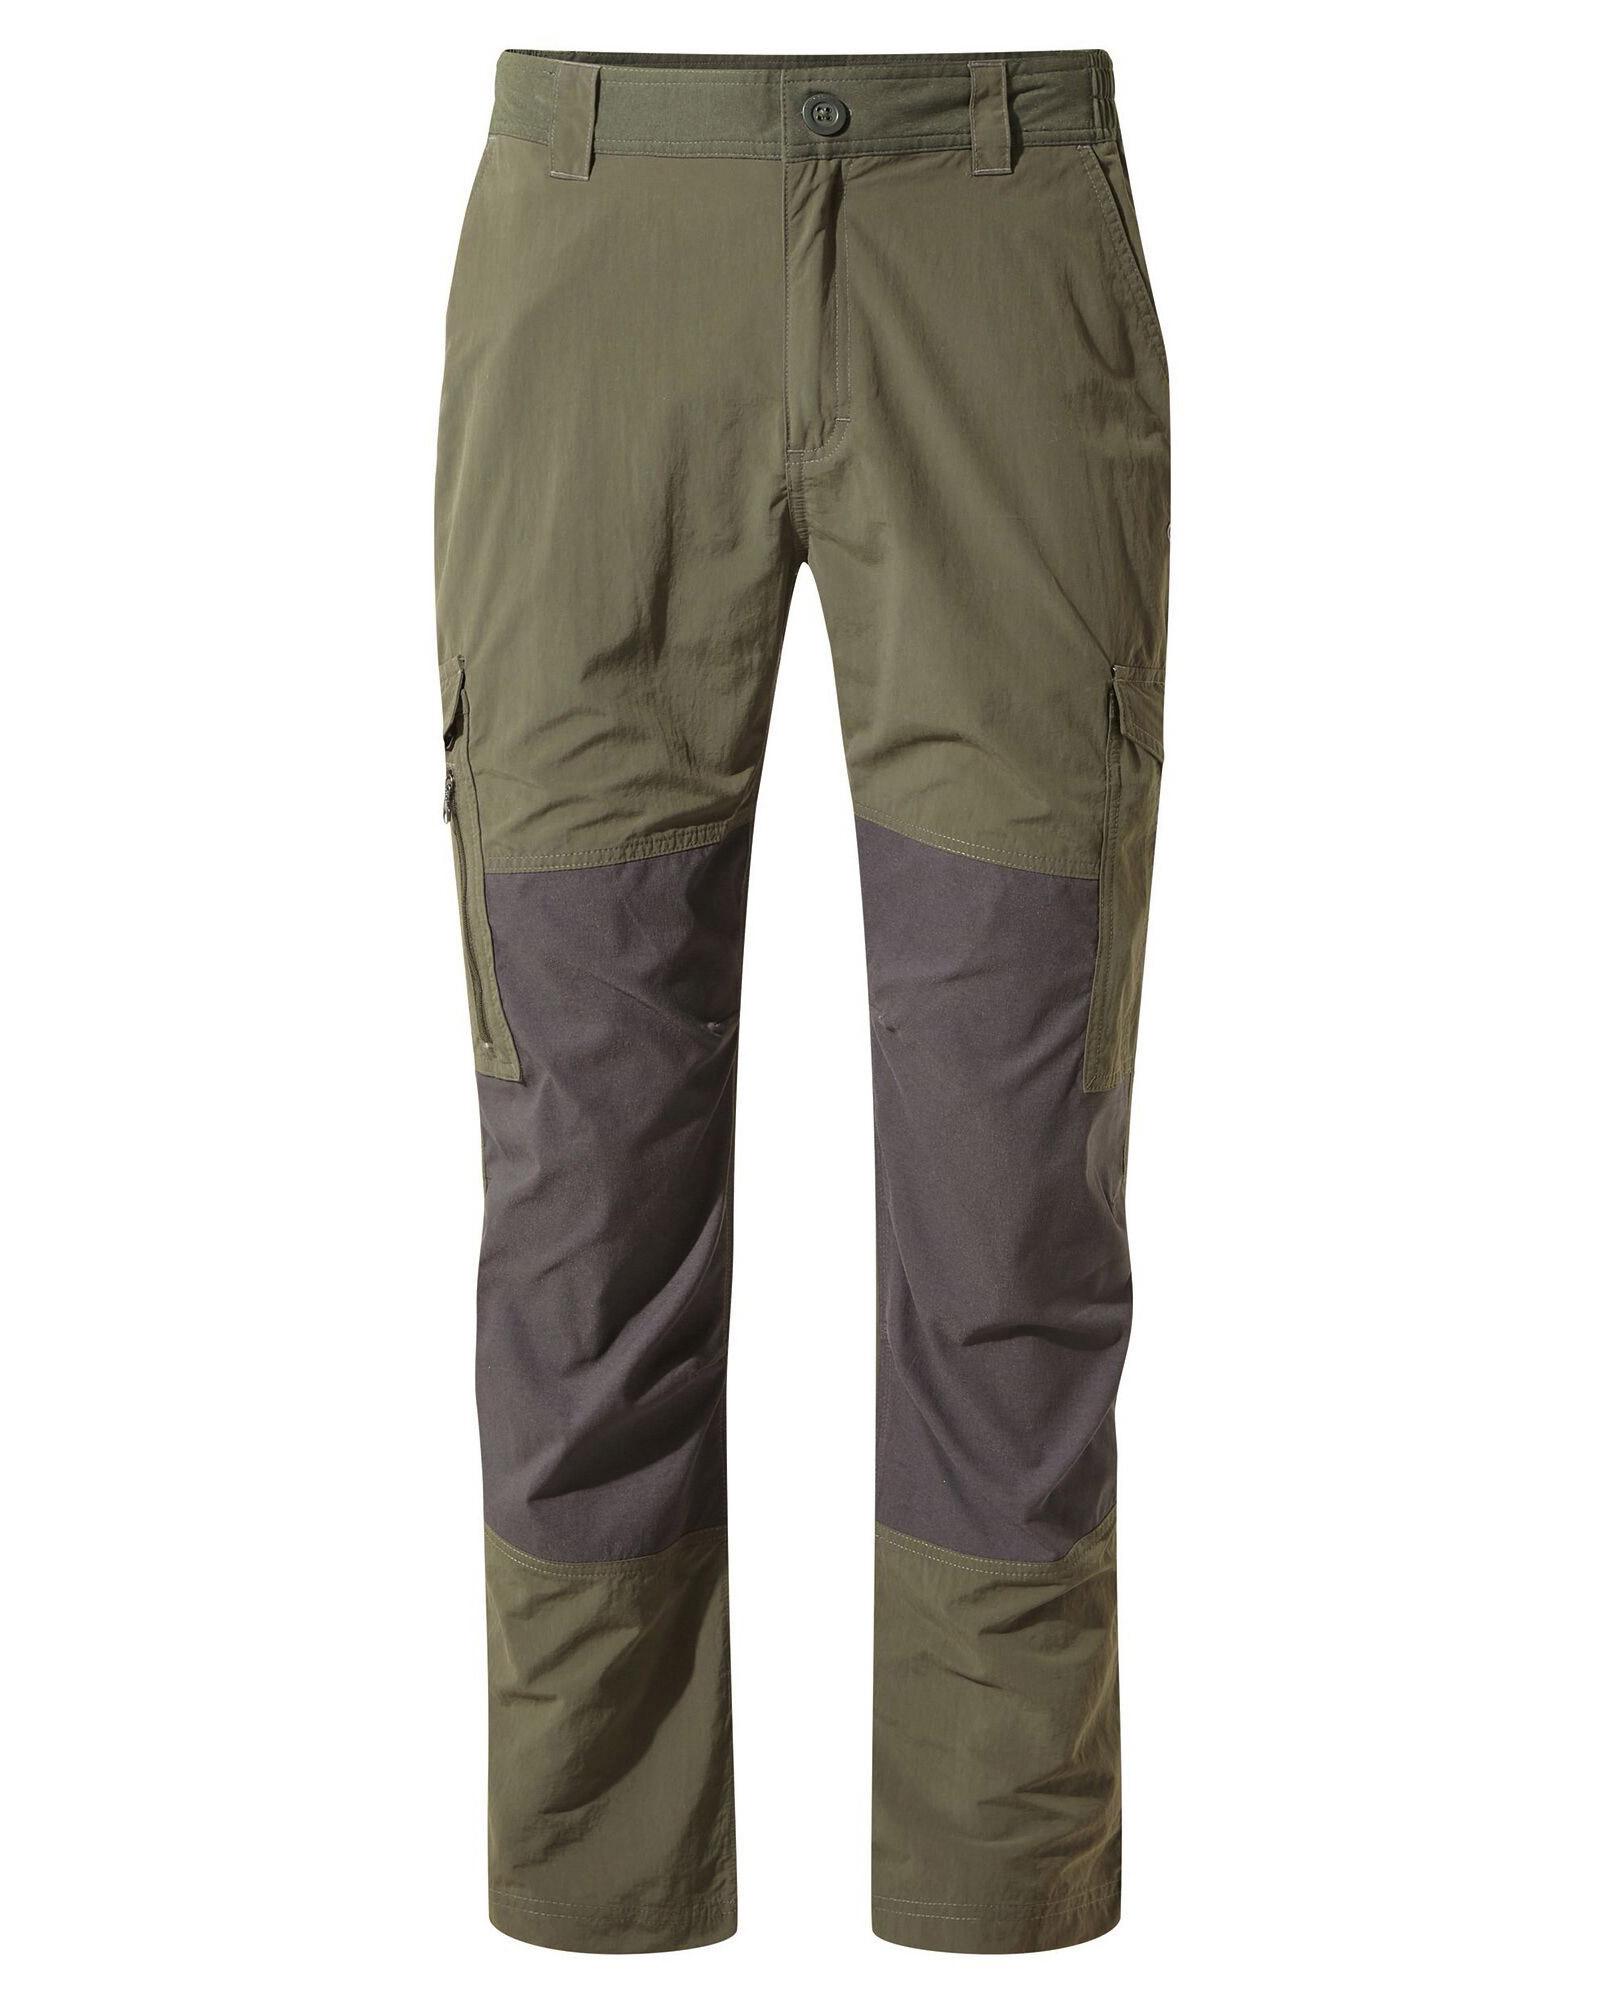 Craghoppers Men's NosiLife Pro Stretch Adventure Pants 0